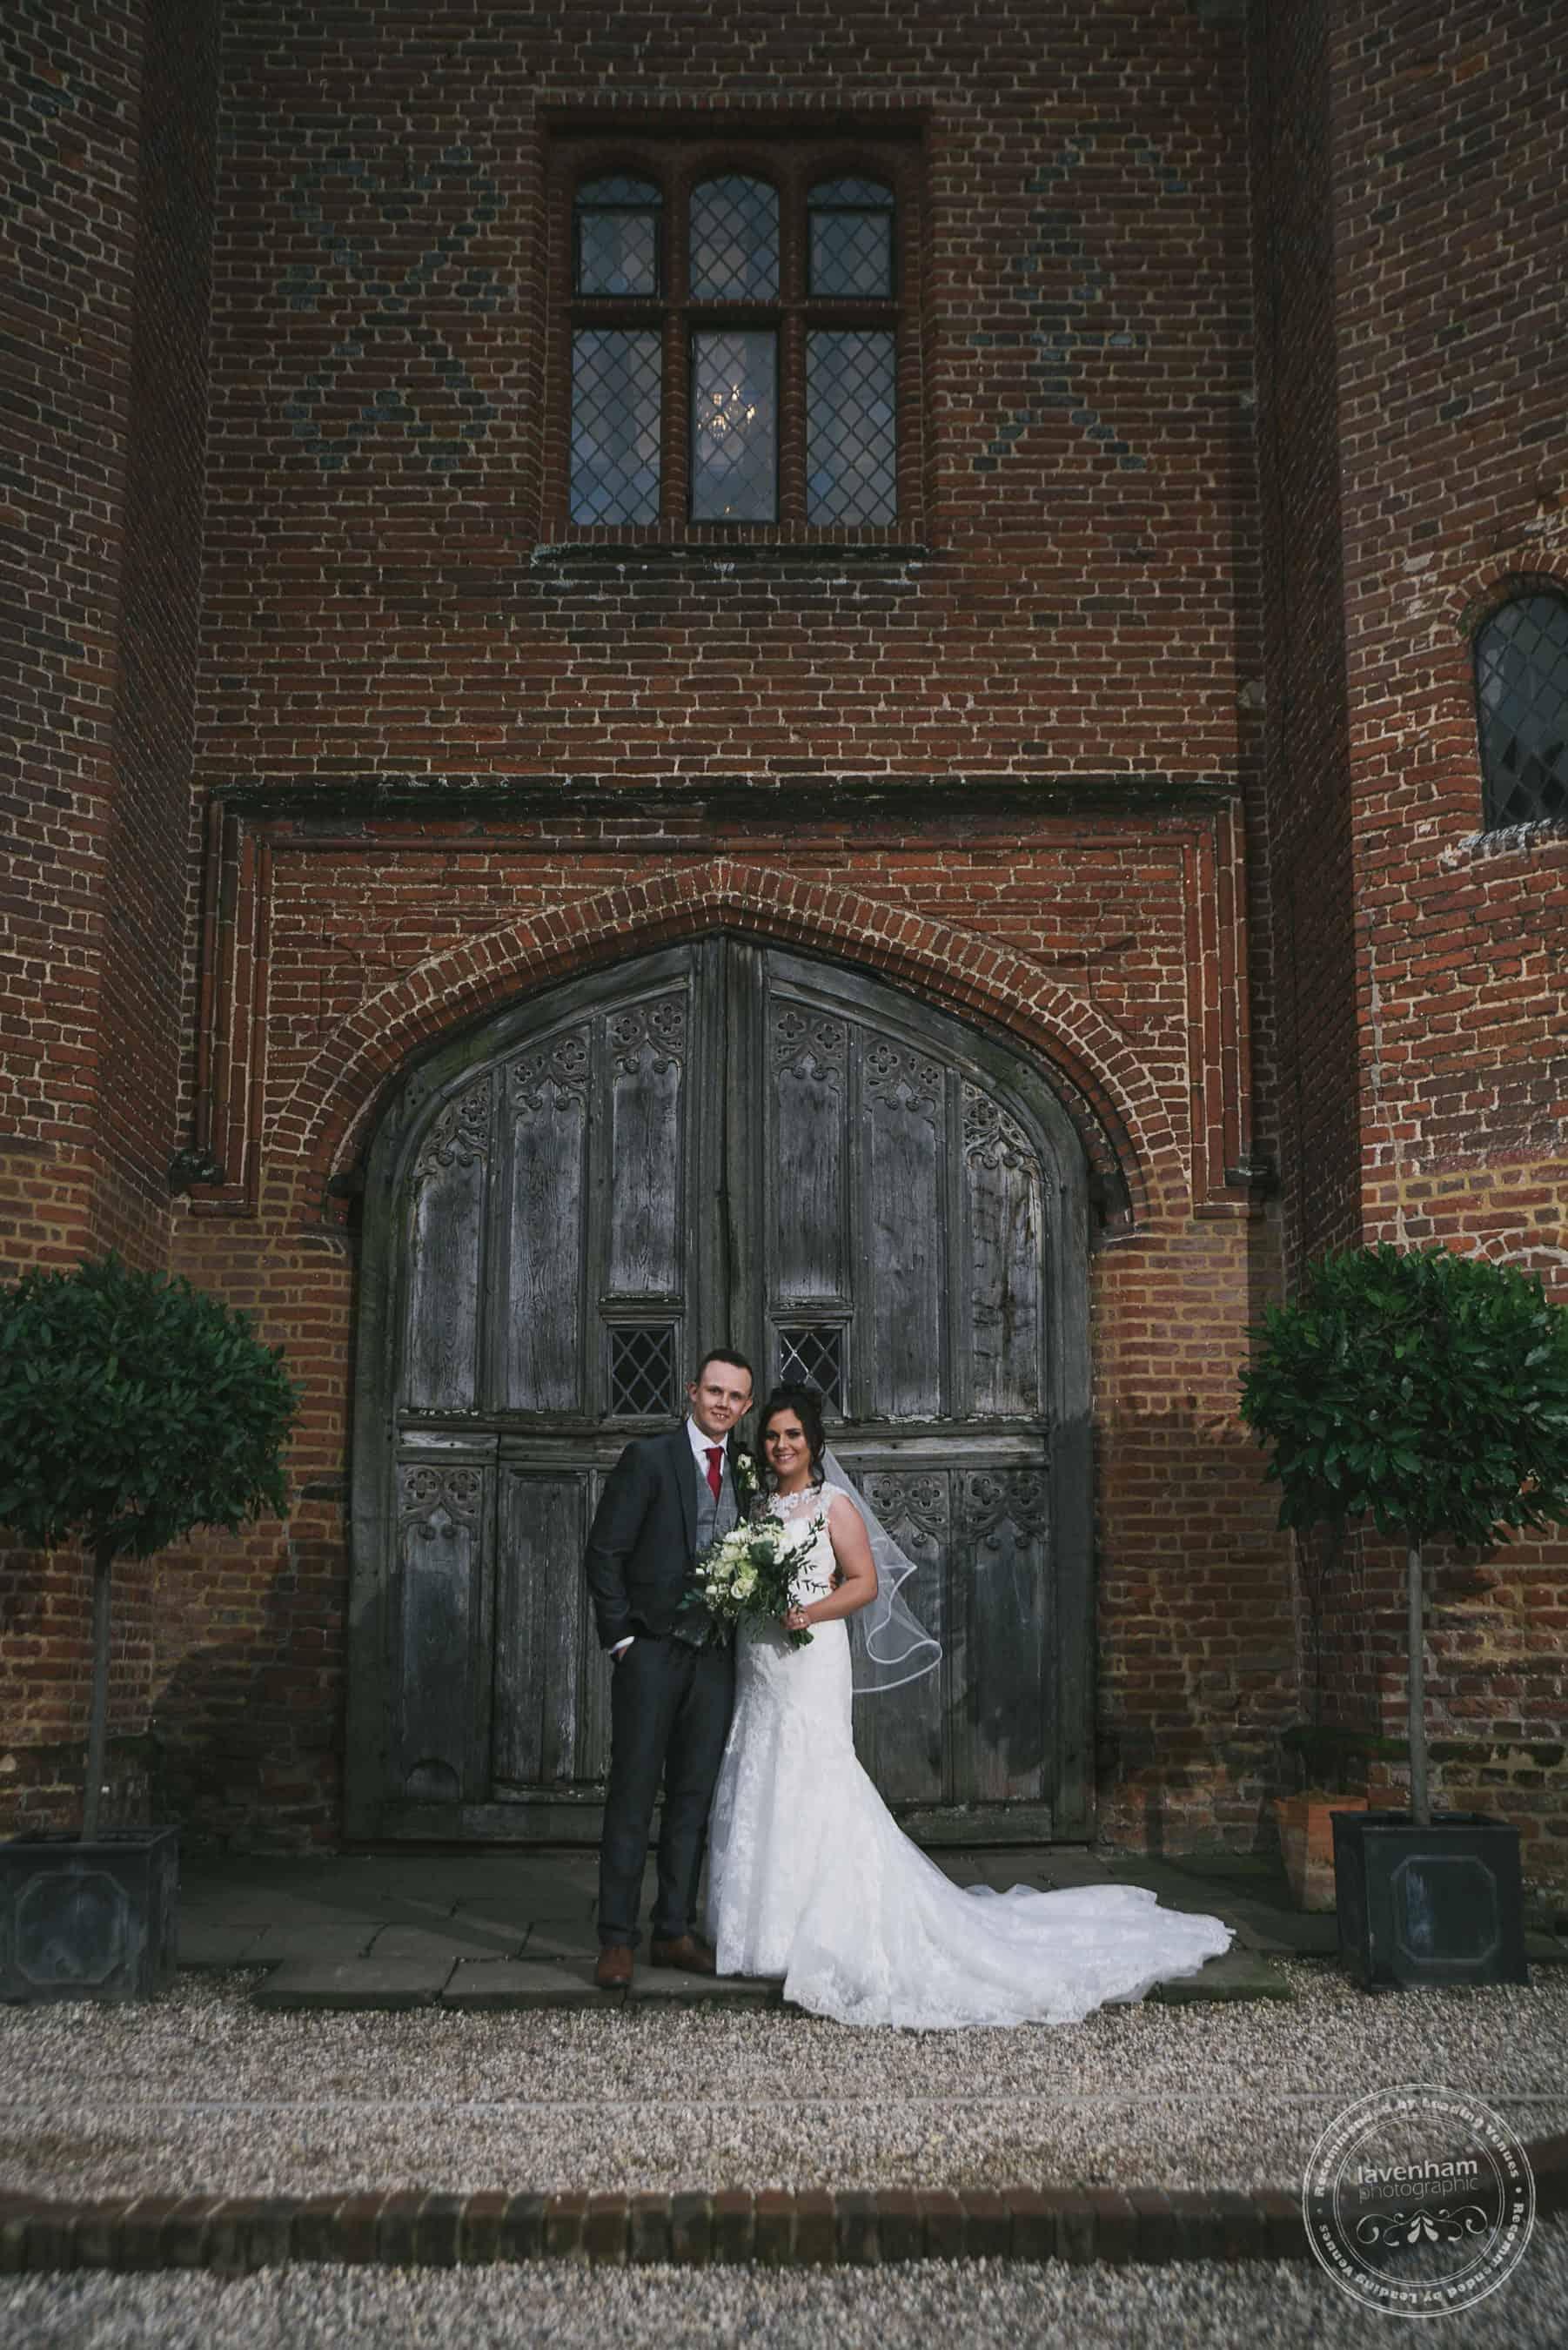 251118 Leez Priory Wedding Photography by Lavenham Photographic 076